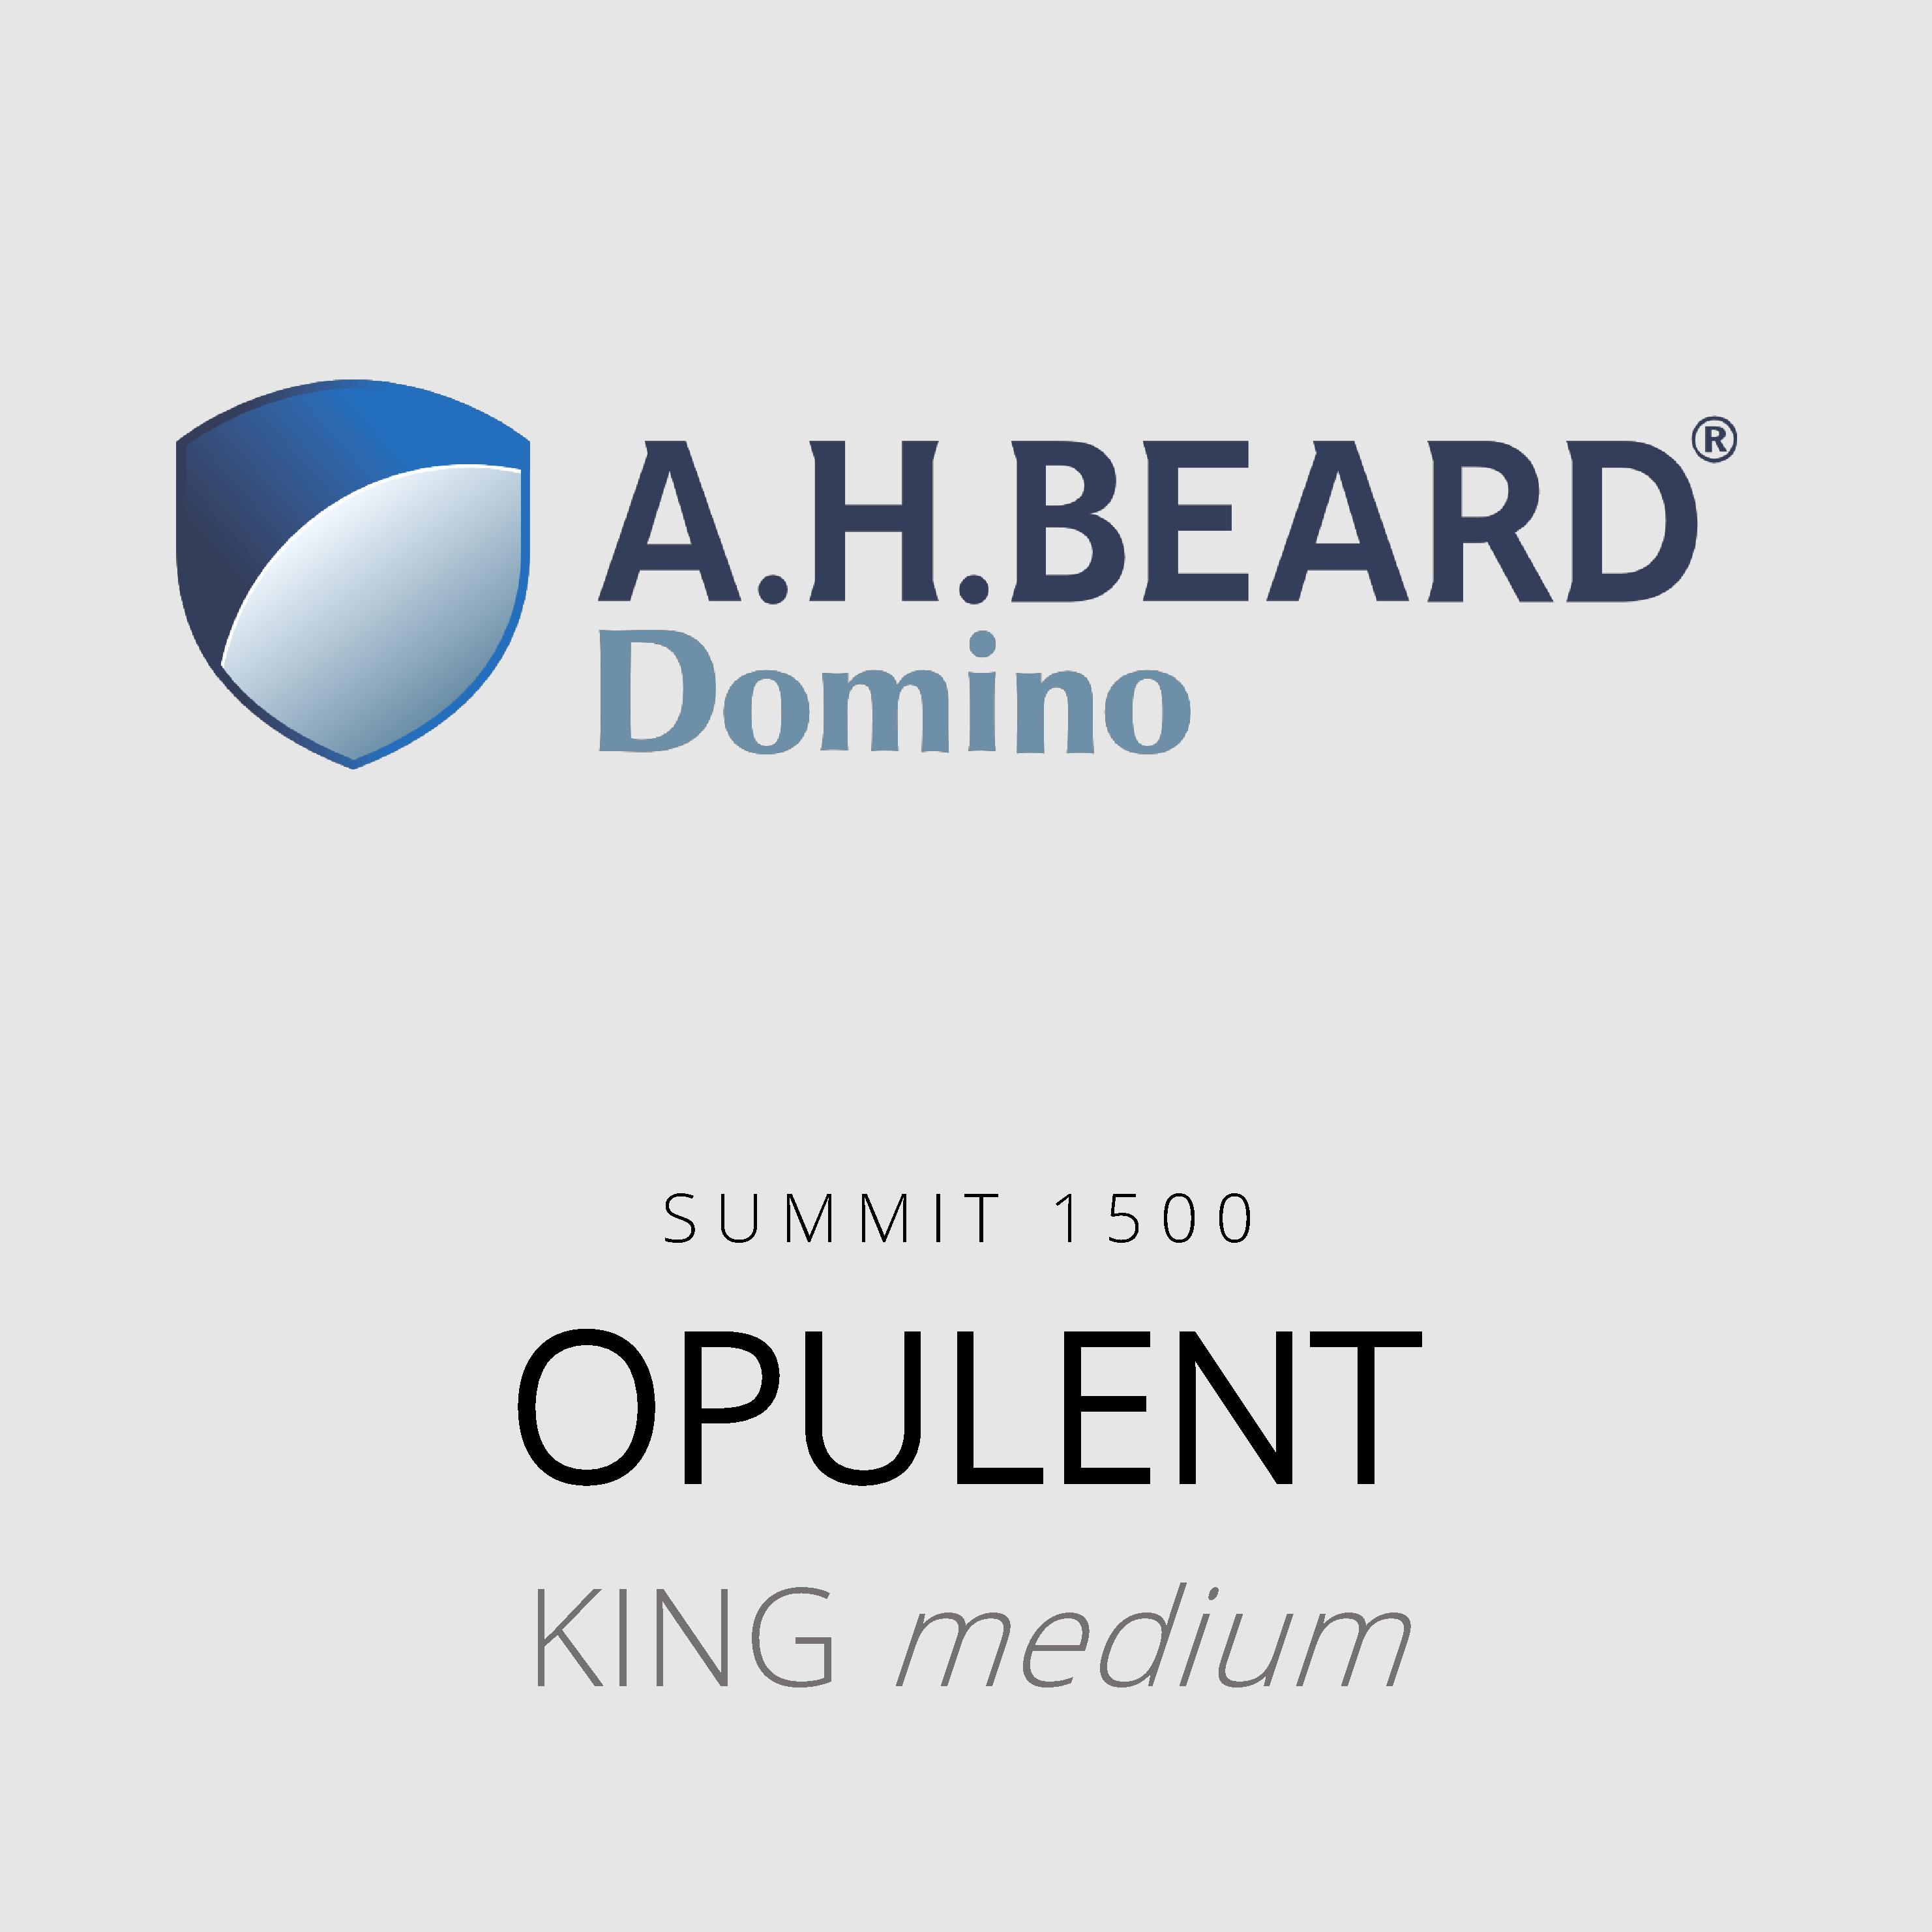 AH Beard Domino – Opulent – Summit 1500 – King Medium Mattress